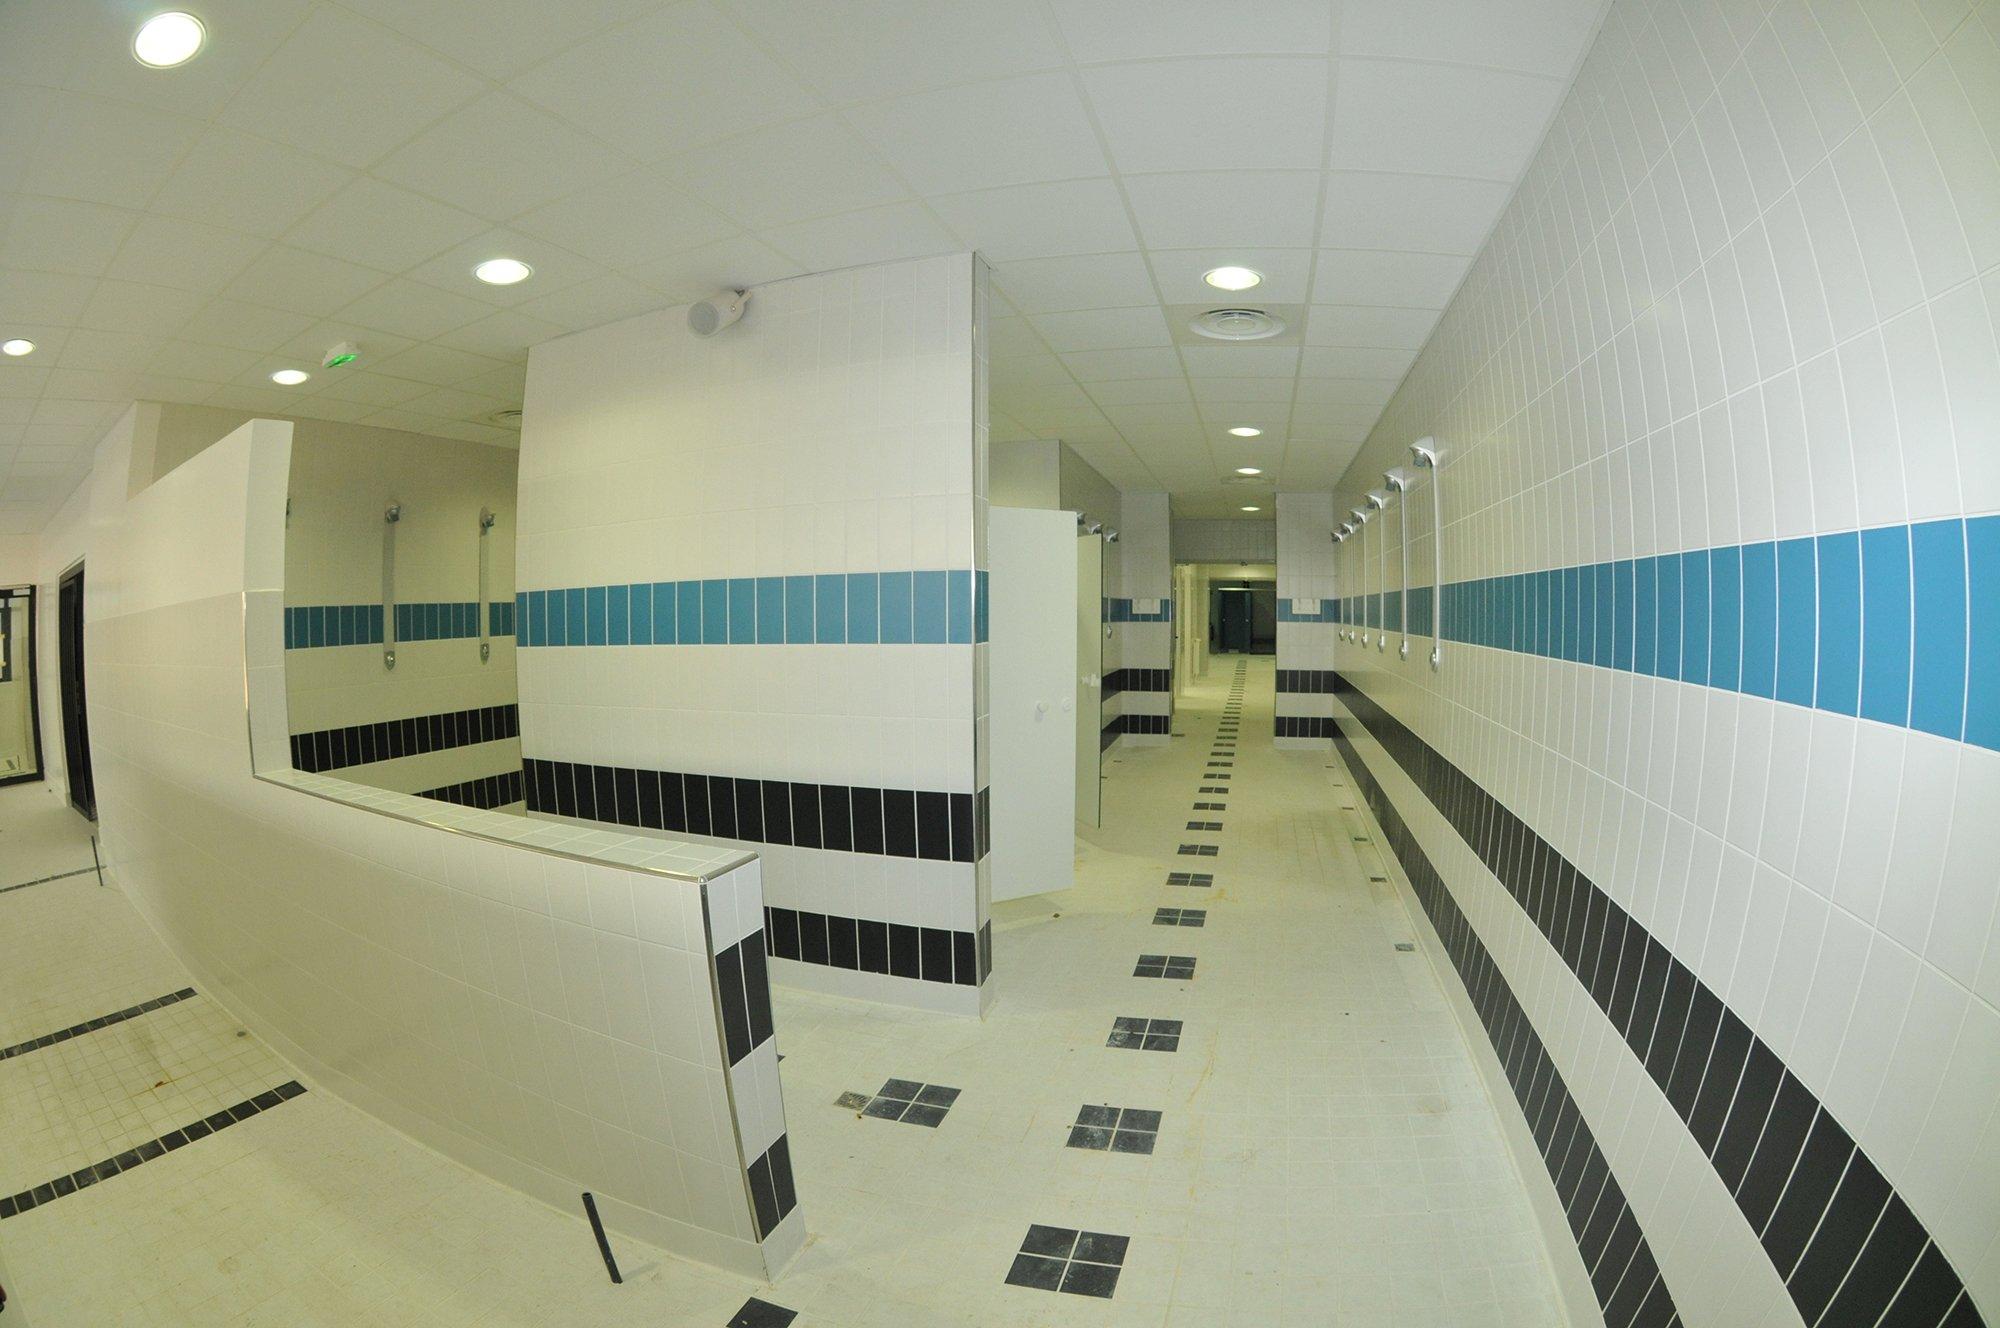 Complexe salle Omnisports